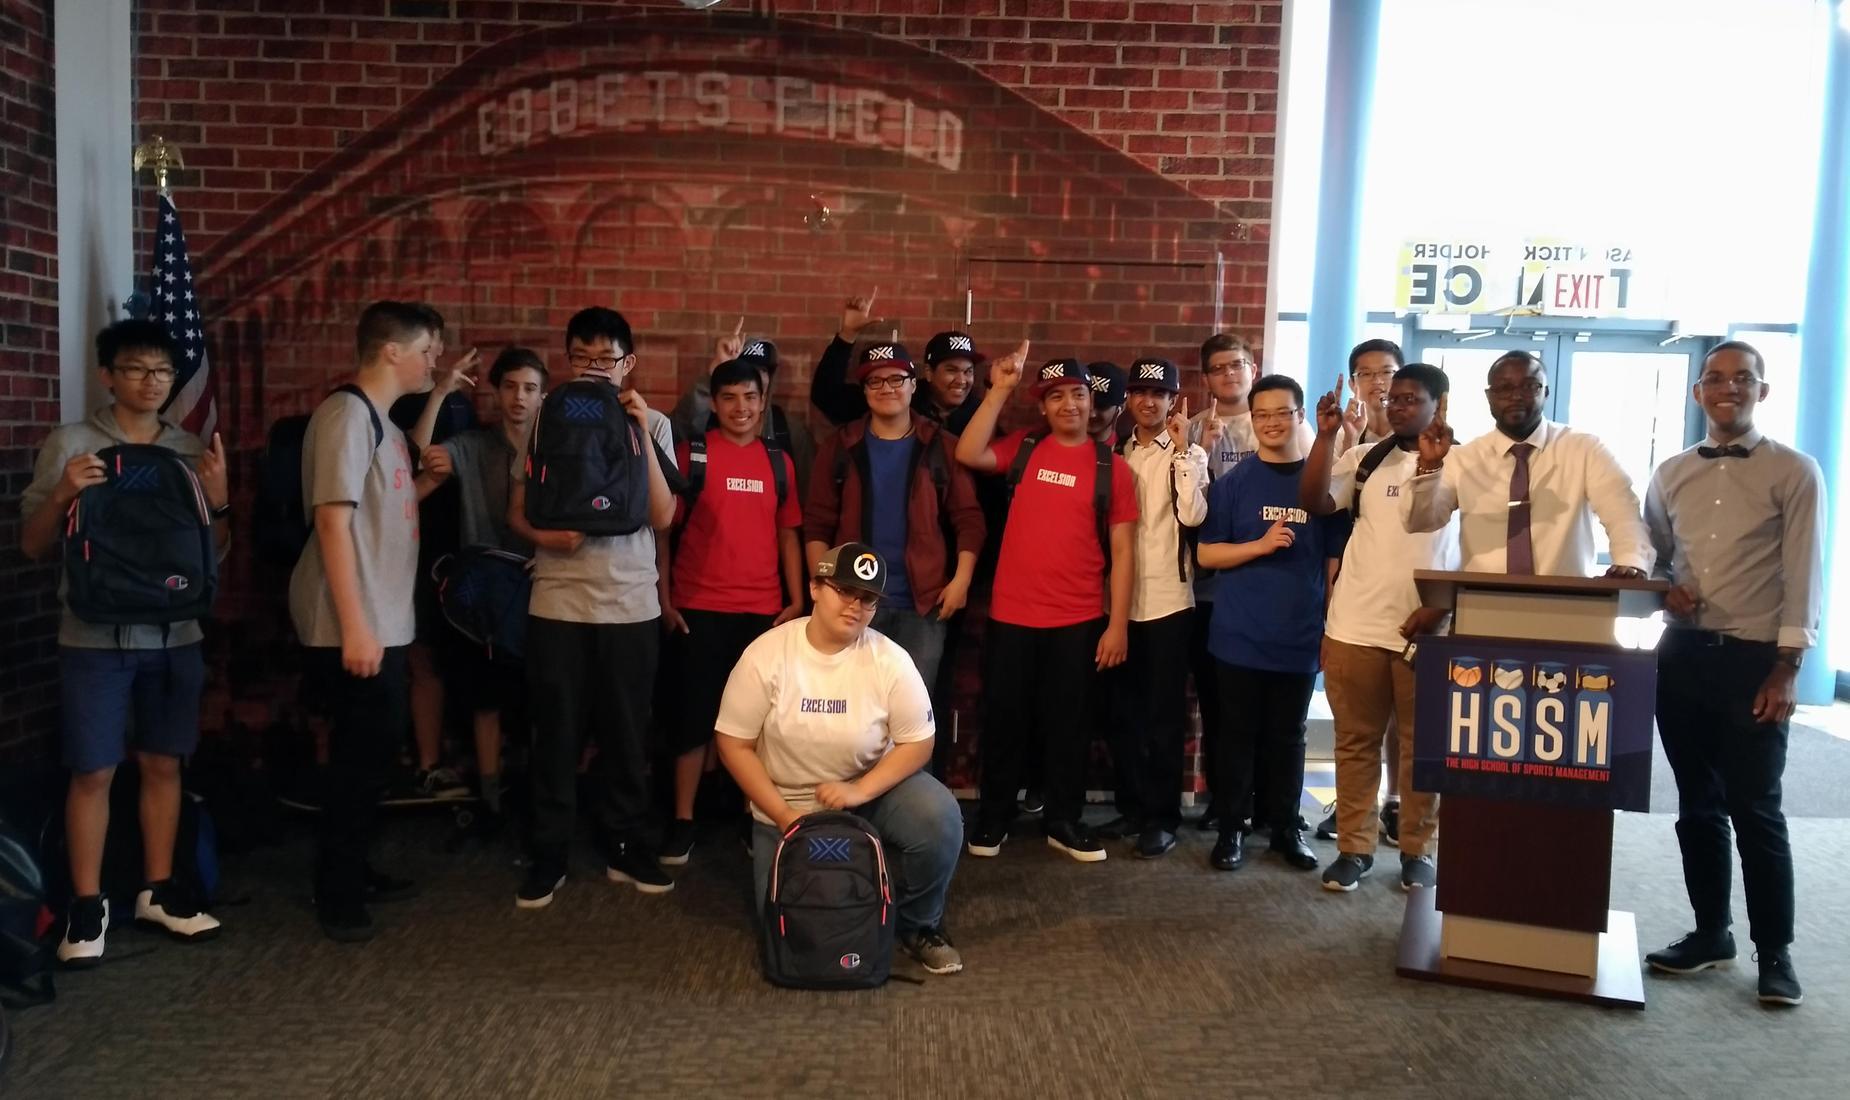 Students behind a HSSM podium